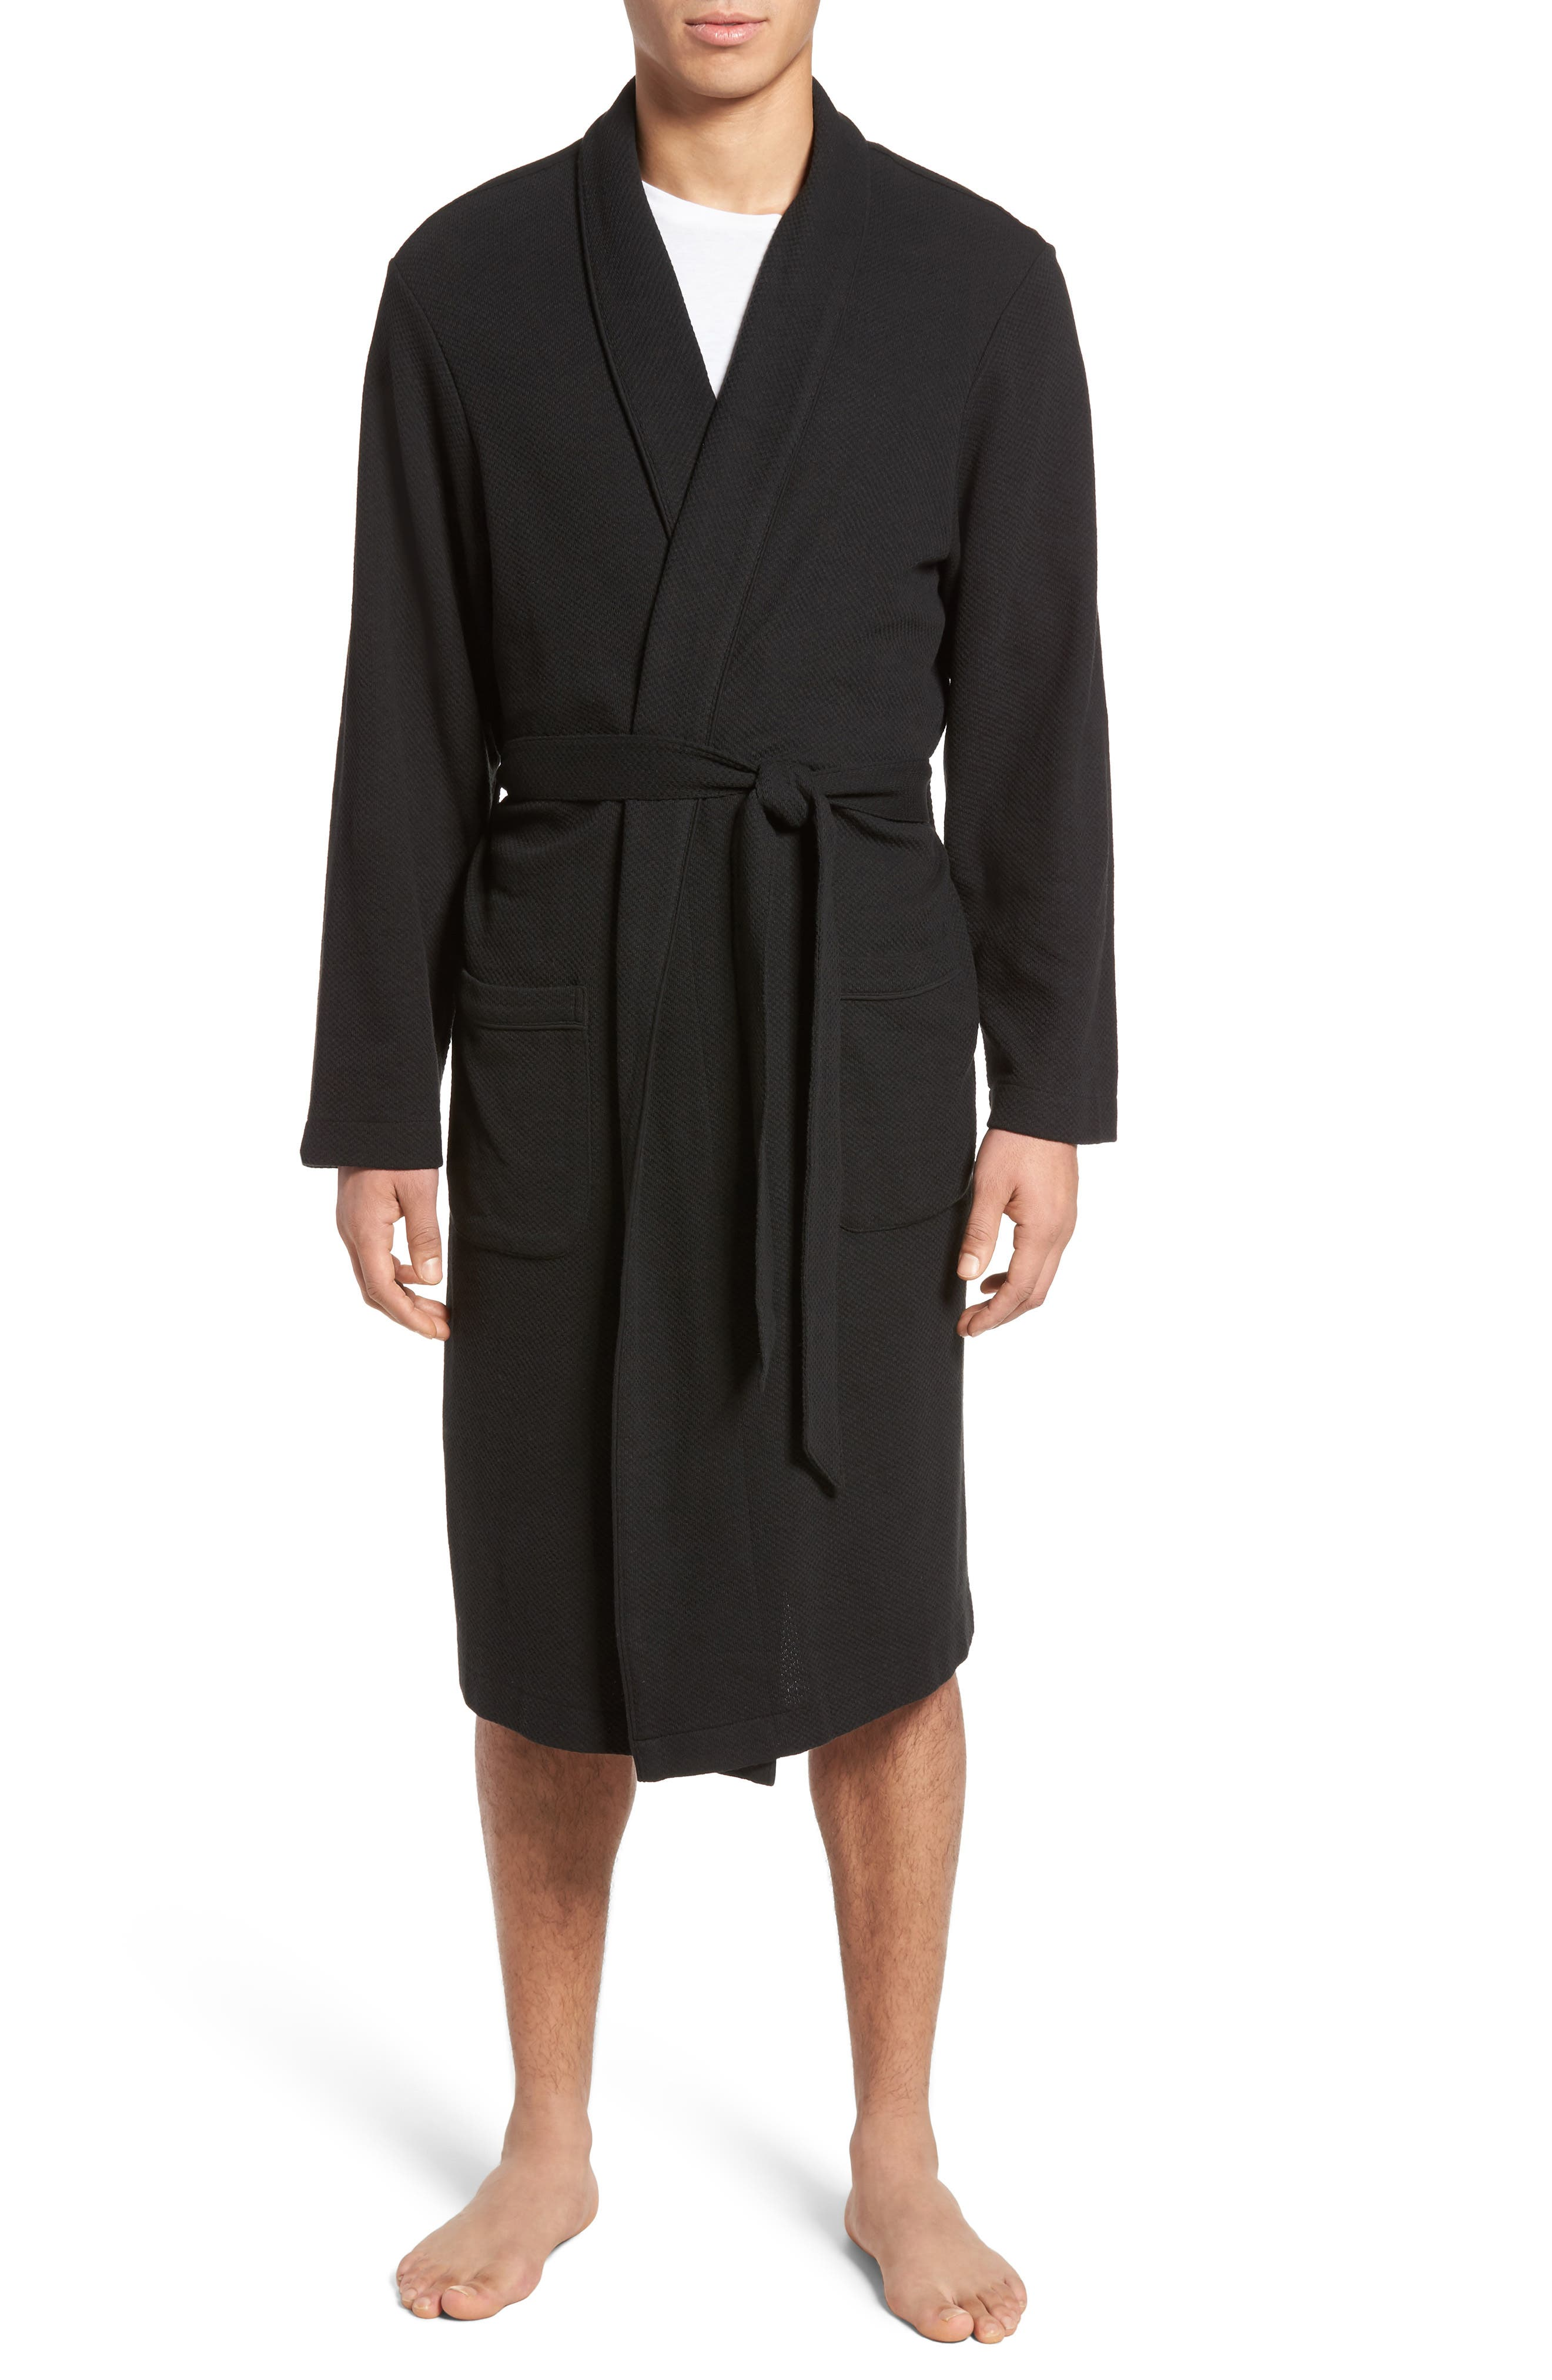 Thermal Robe,                         Main,                         color, BLACK